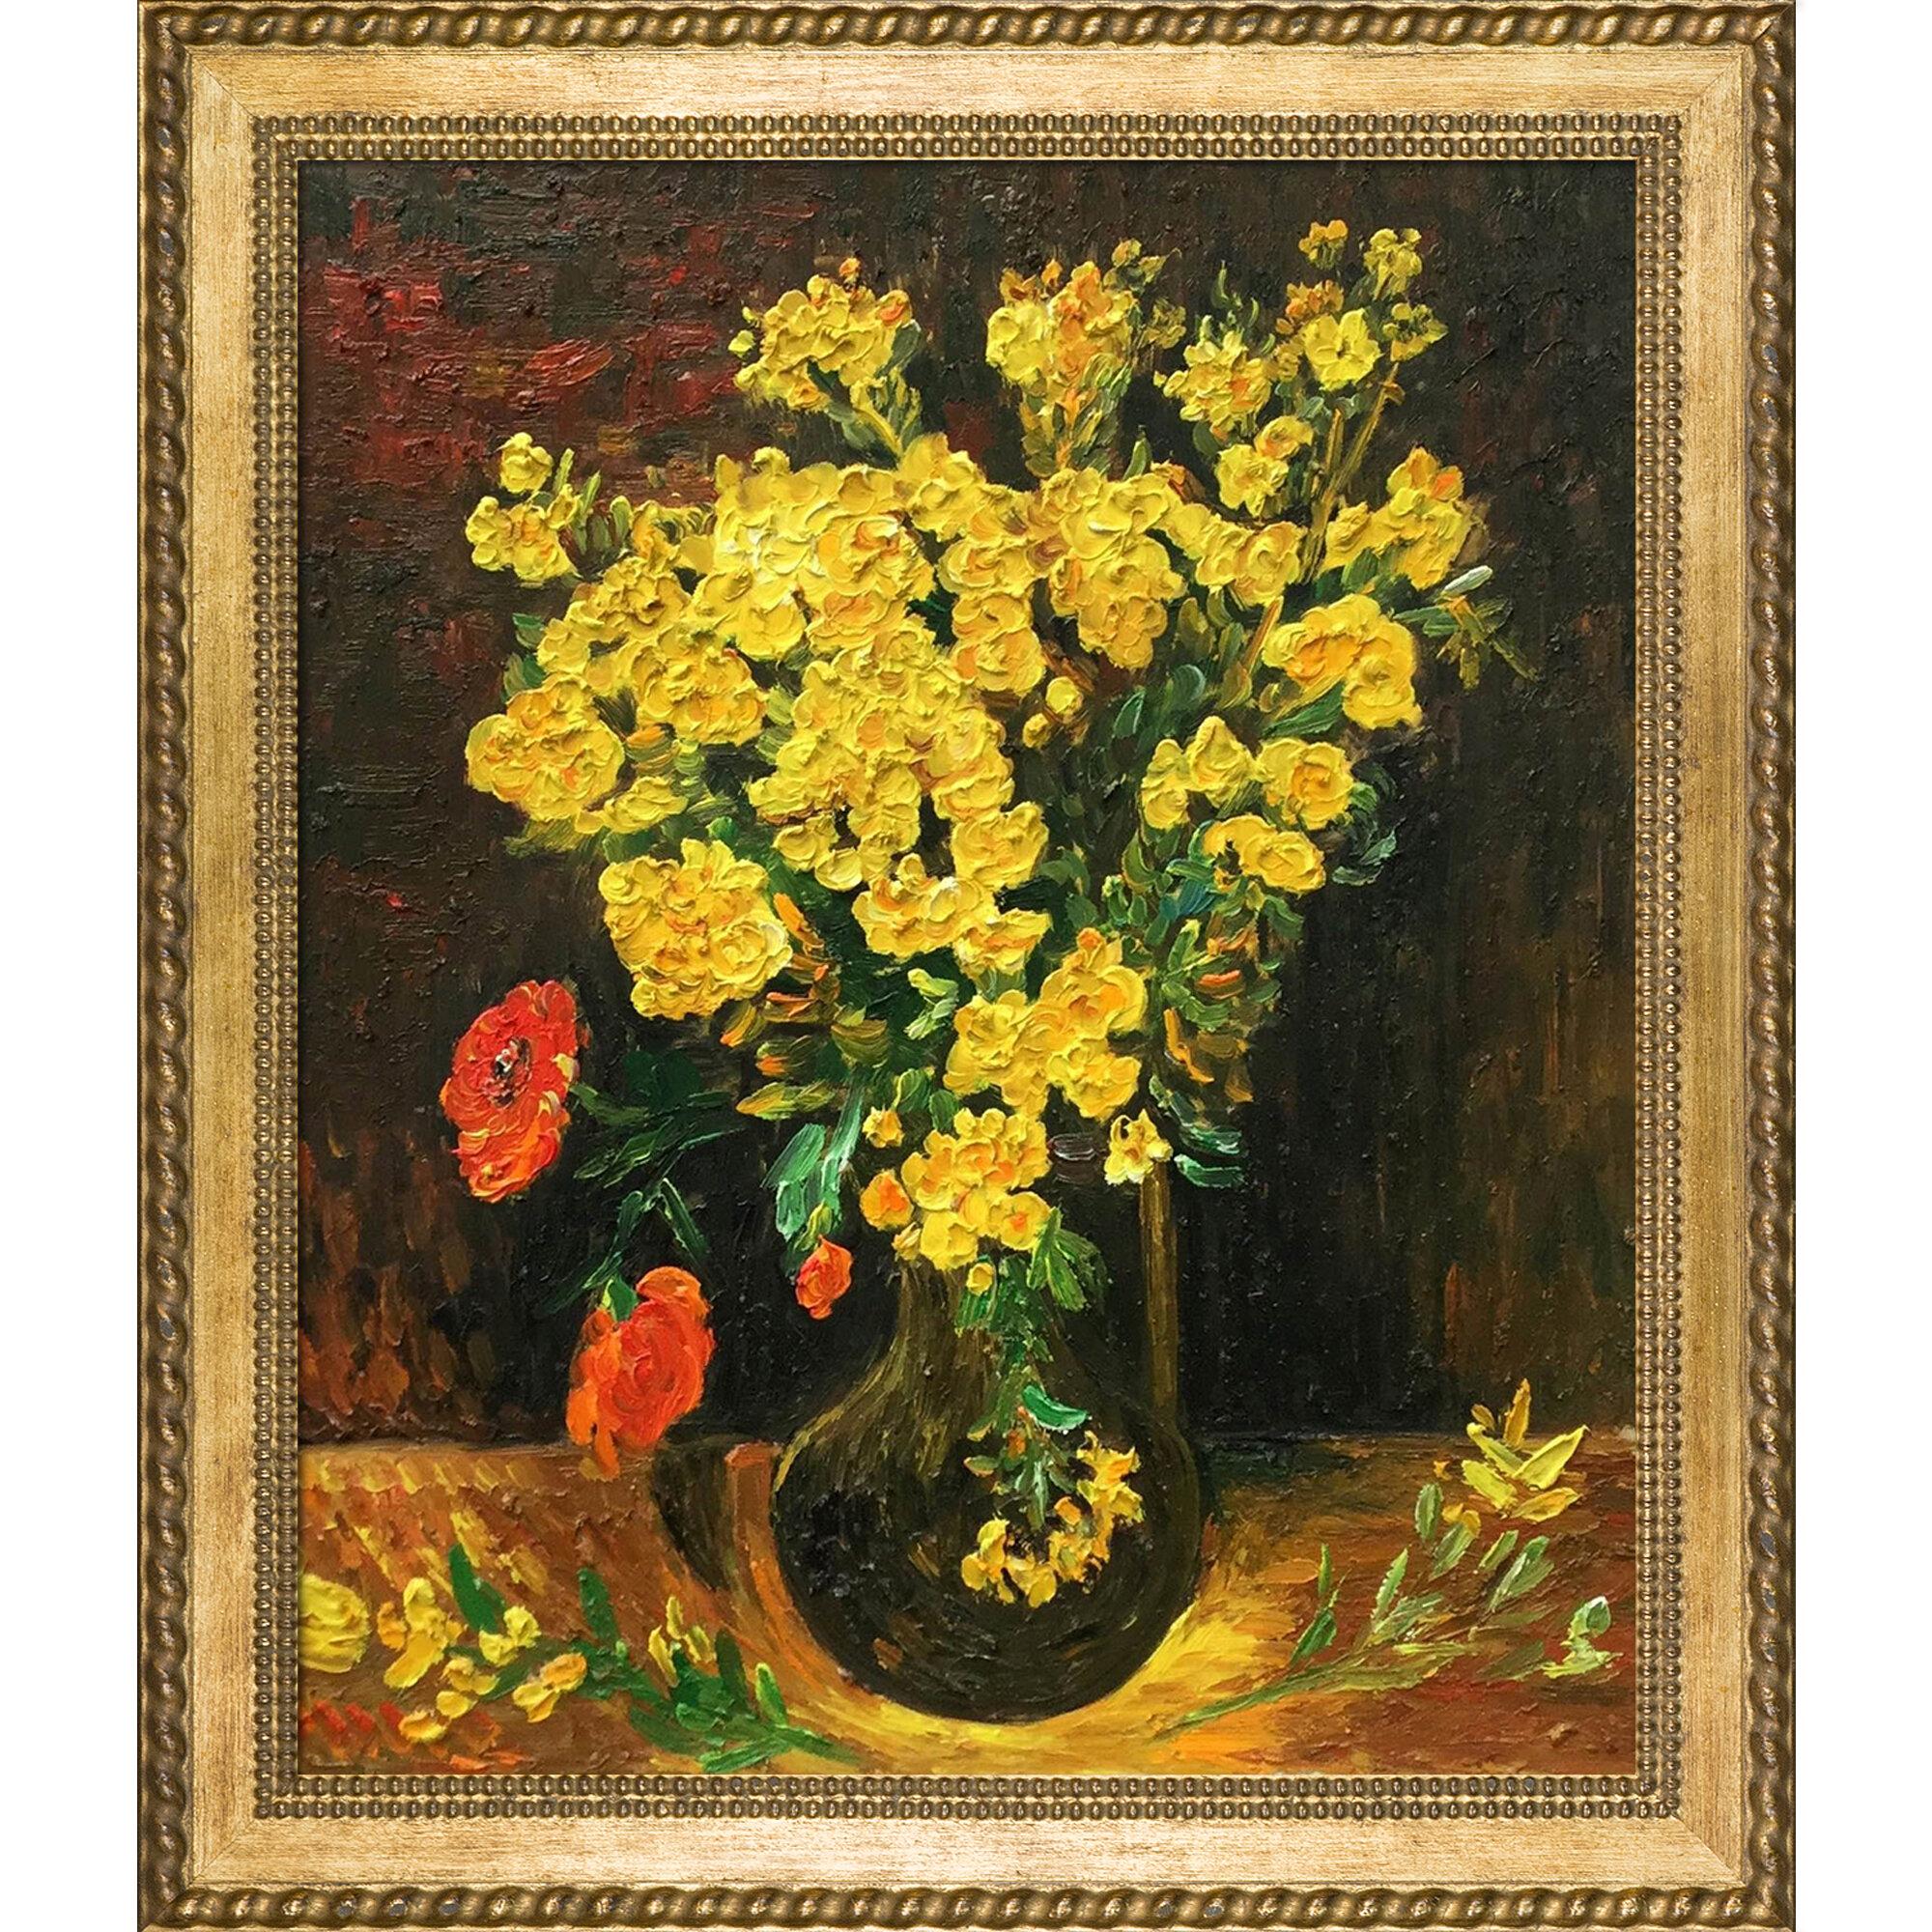 Tori Home \u0027Vase with Viscaria (Poppy Flowers)\u0027 by Vincent Van Gogh Framed Painting Print   Wayfair & Tori Home \u0027Vase with Viscaria (Poppy Flowers)\u0027 by Vincent Van Gogh ...